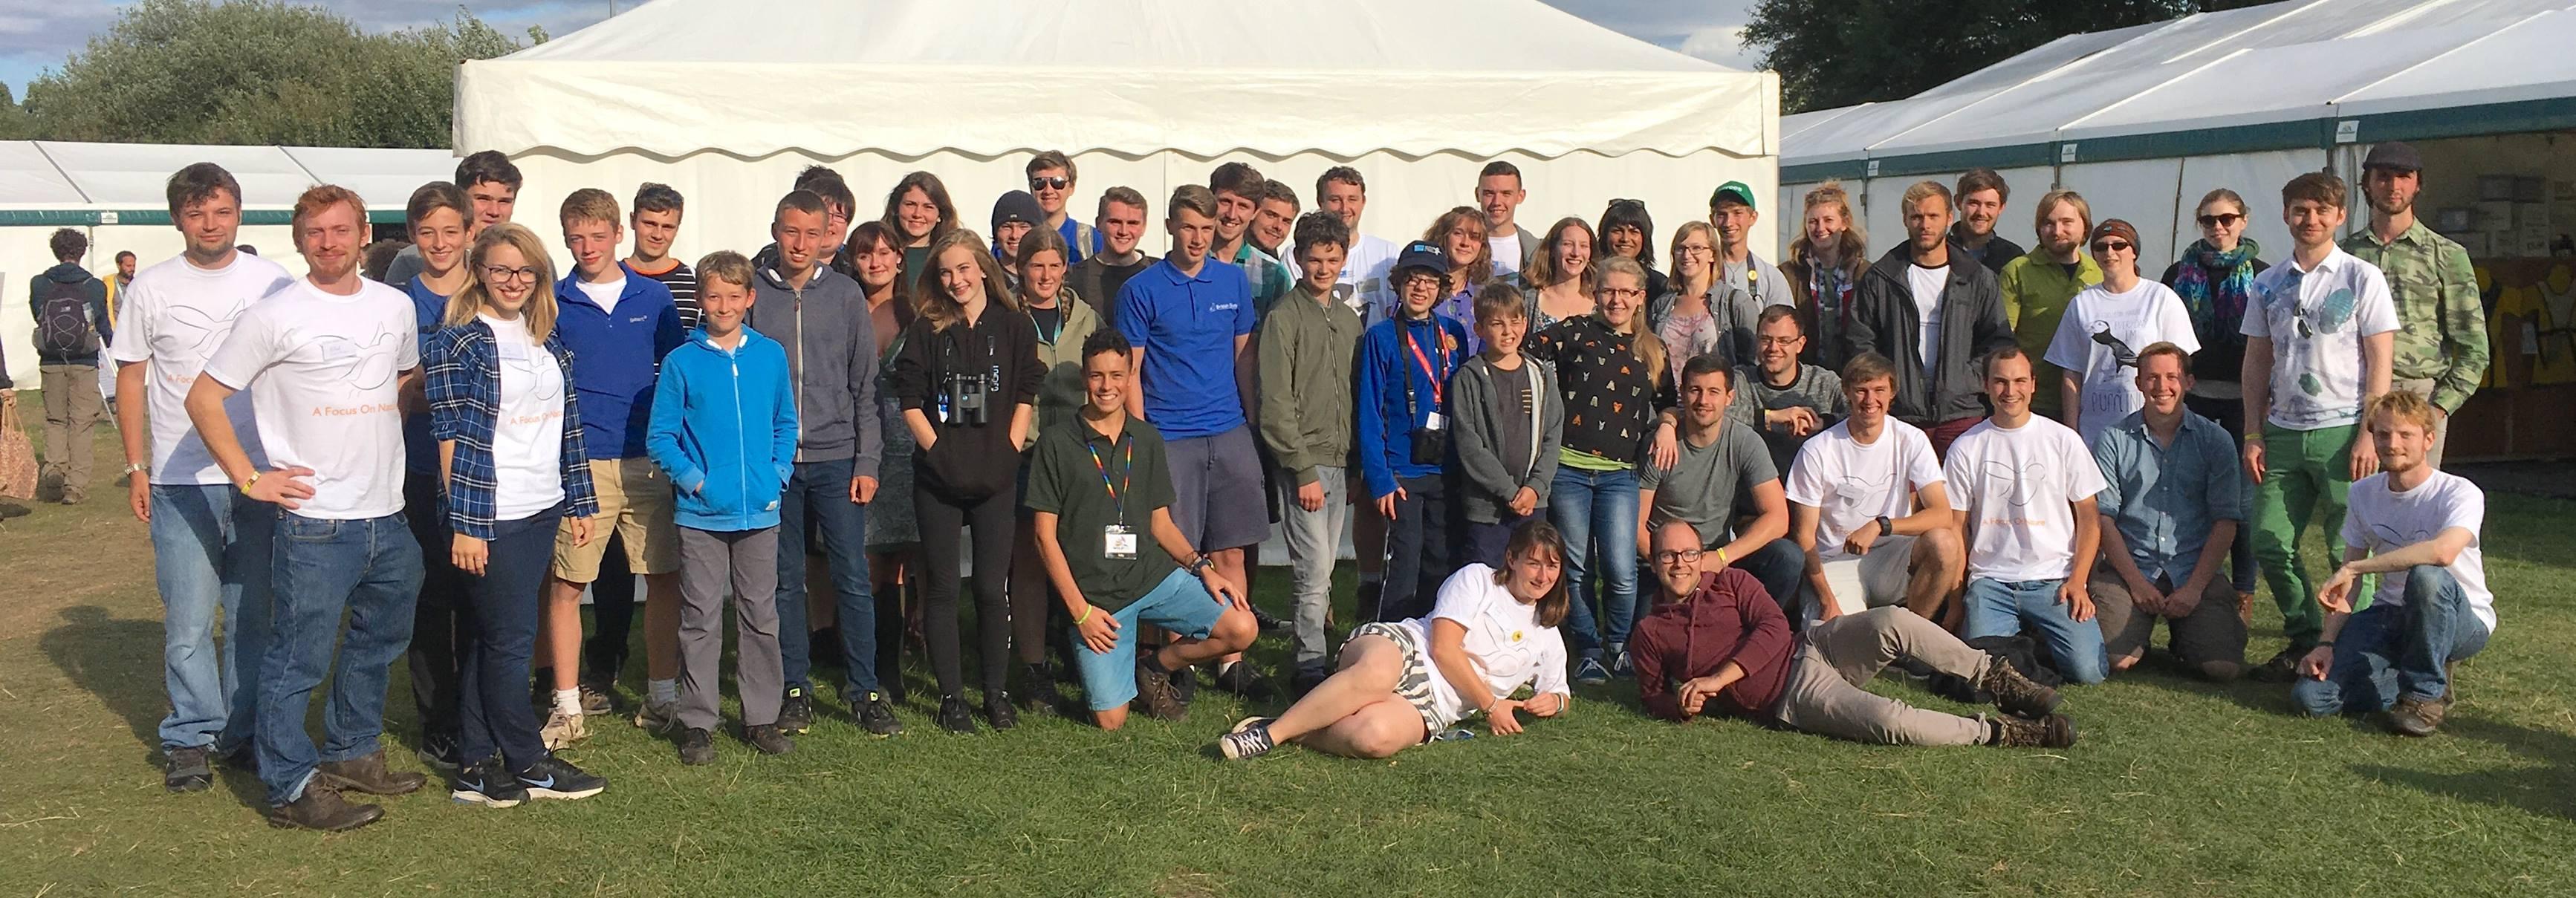 Birdfair 2017 - AFON Members